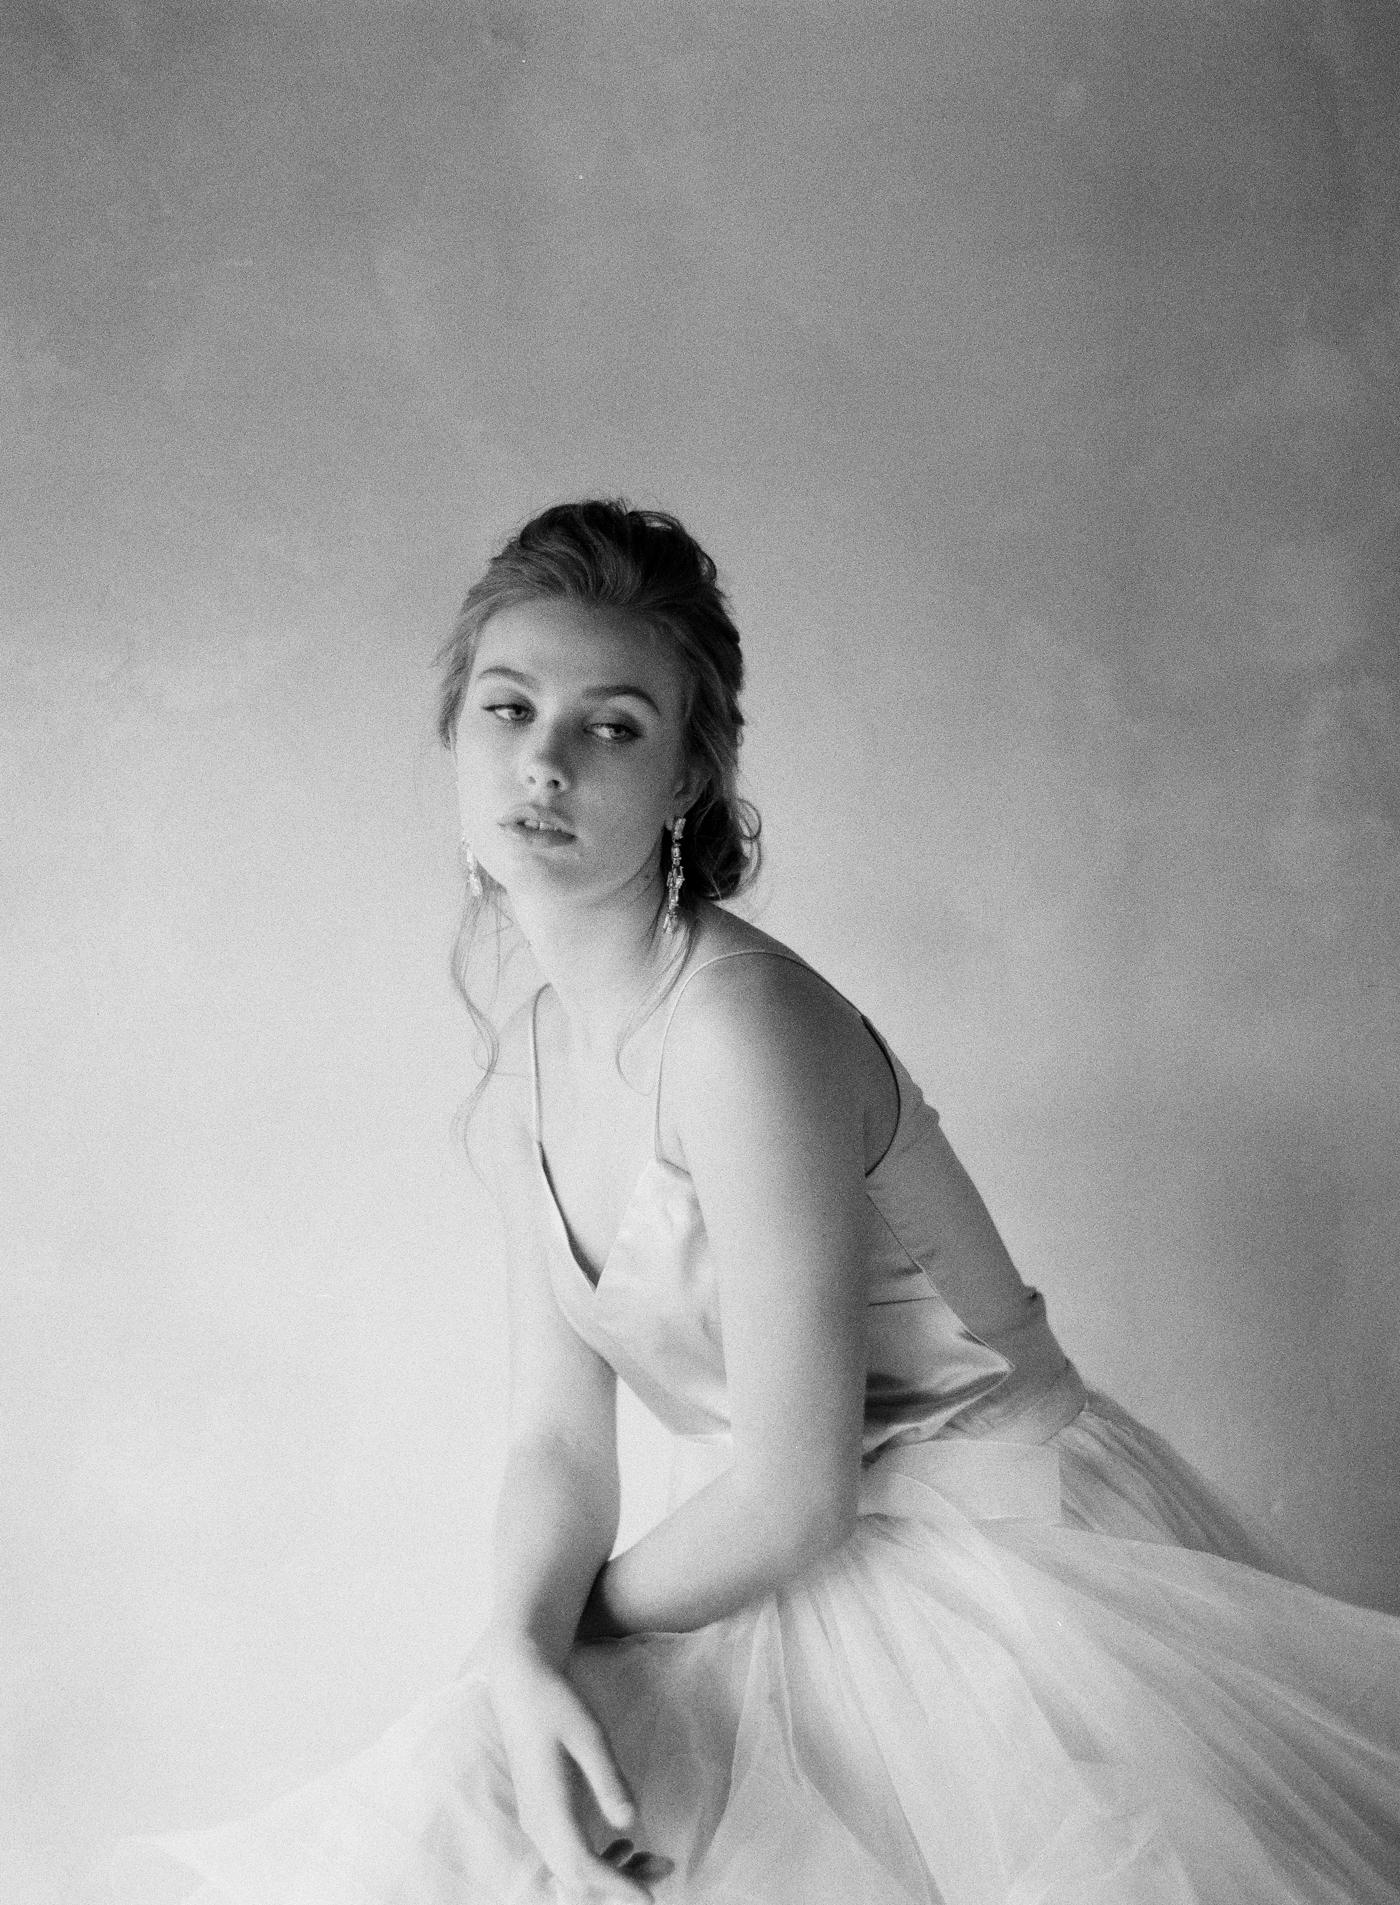 Classic-Bridal-Portraits-221-Jen_Huang-BHLDN-Winter-Bride-168-Jen_Huang-000010640016.jpg